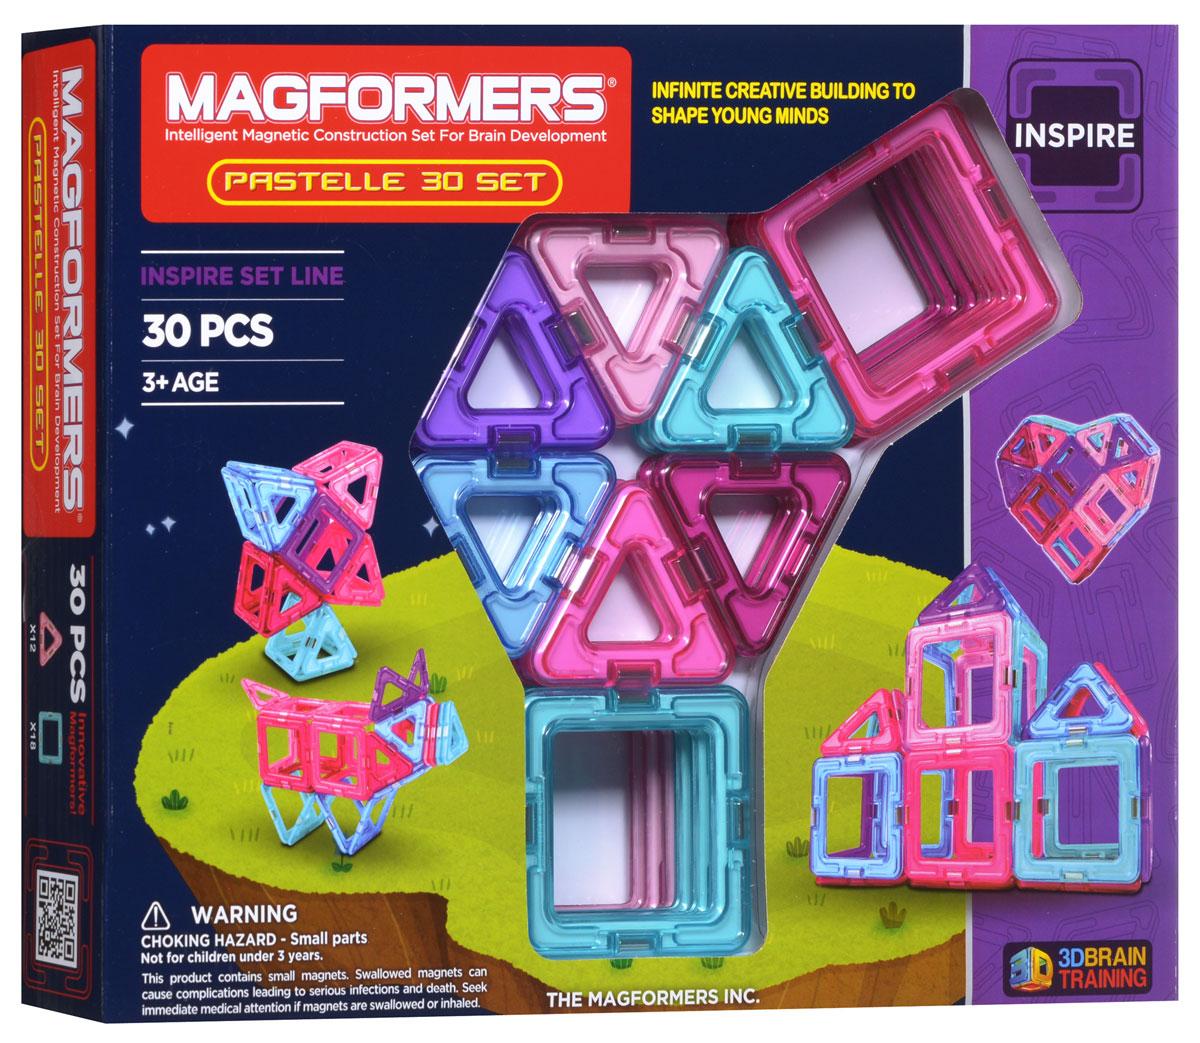 Magformers Магнитный конструктор Pastelle 30 конструкторы magformers магнитный pastelle 14 63096